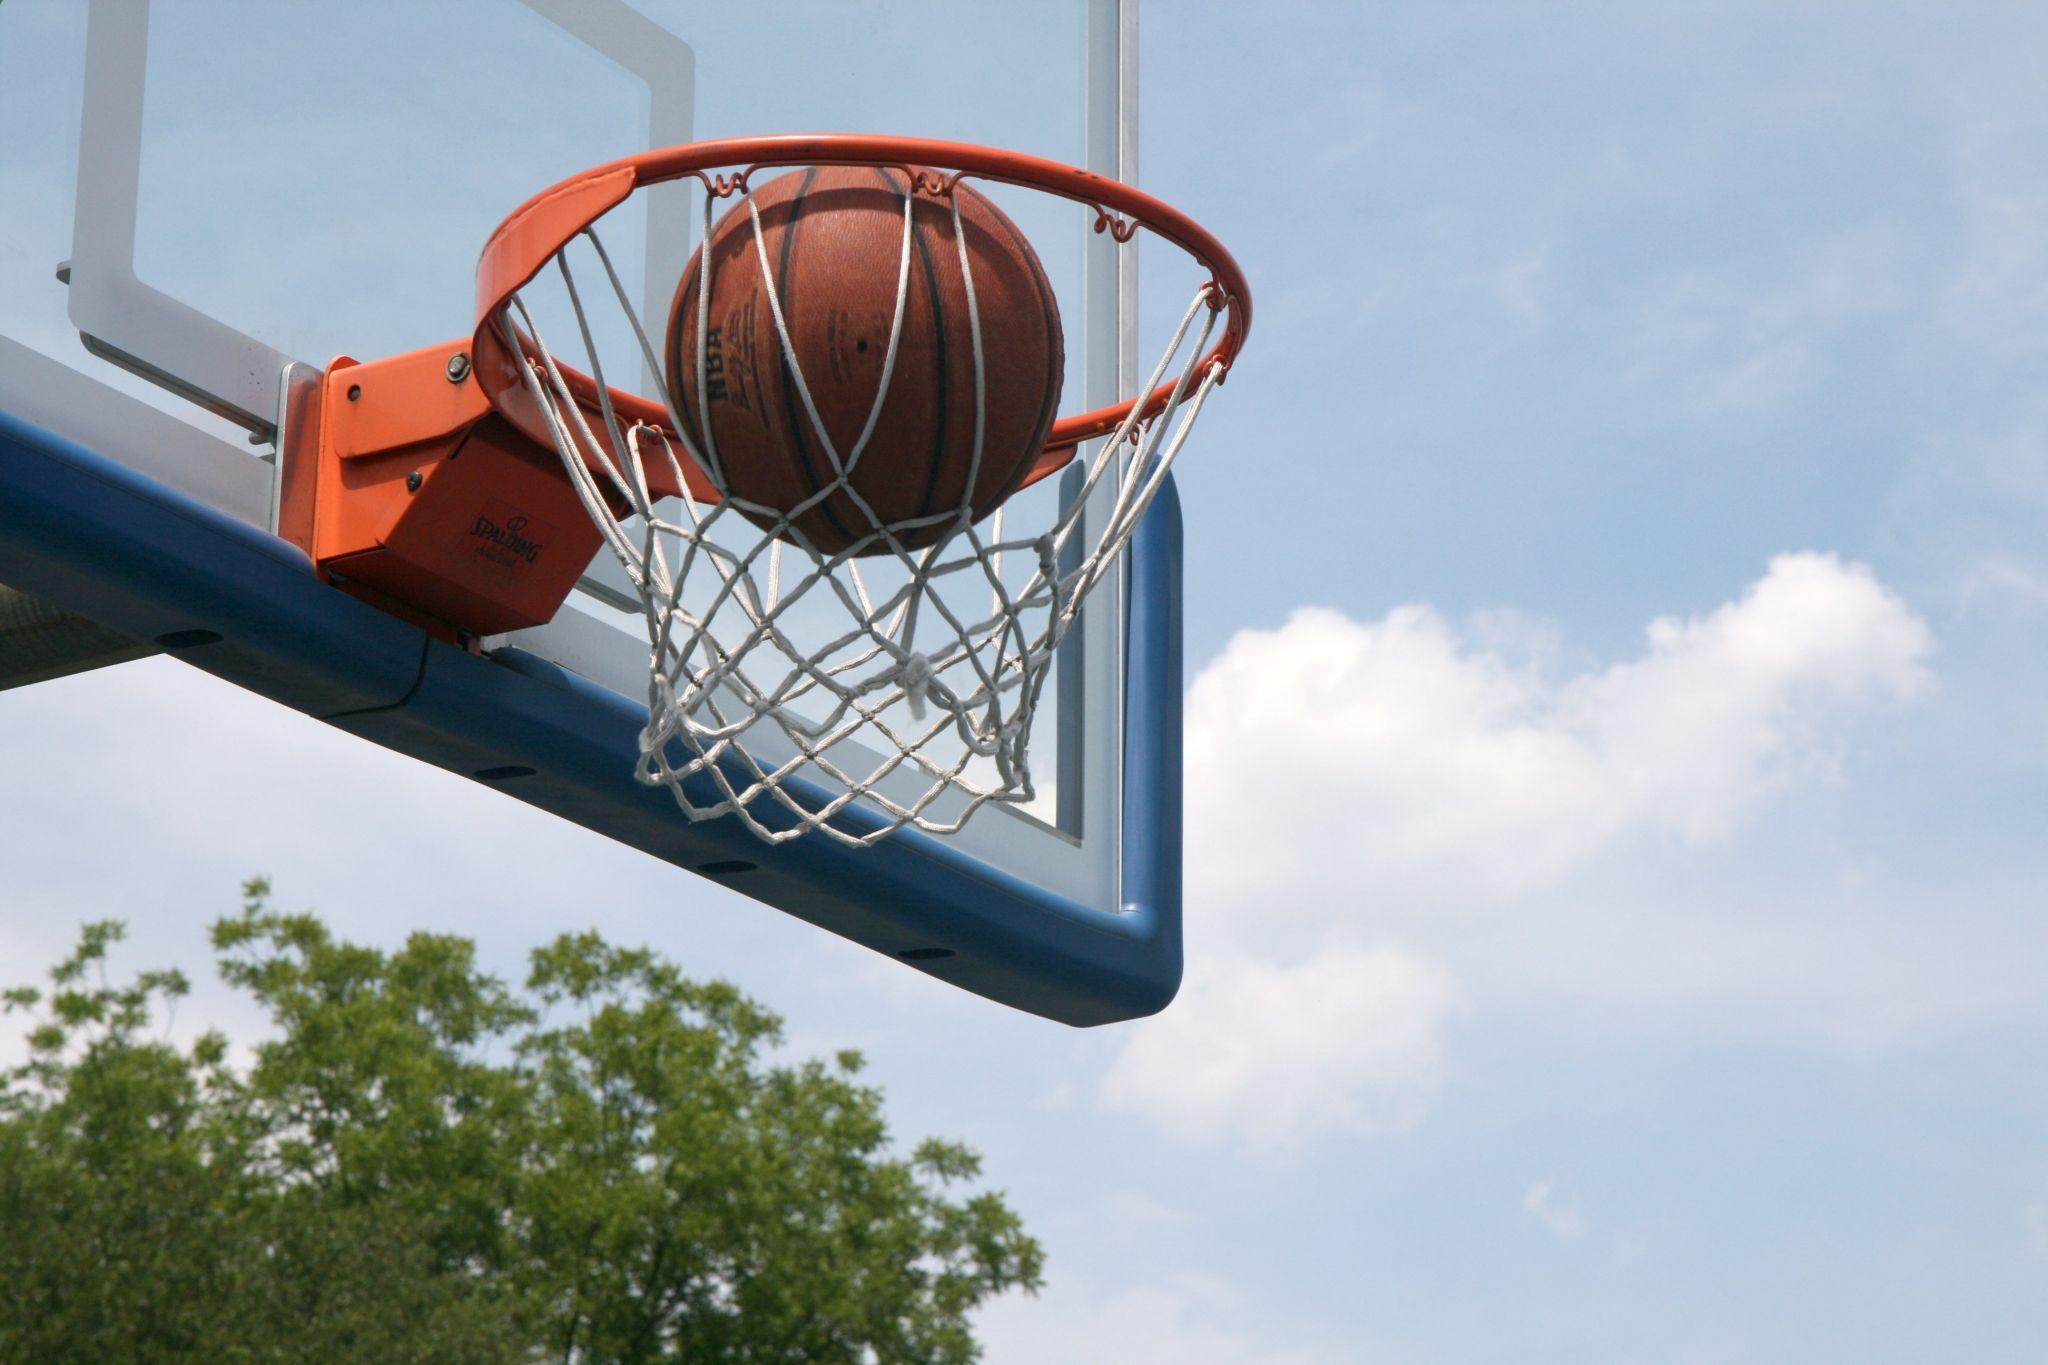 Uk Basketball: Basketball Wallpaper Hd Backgrounds Images